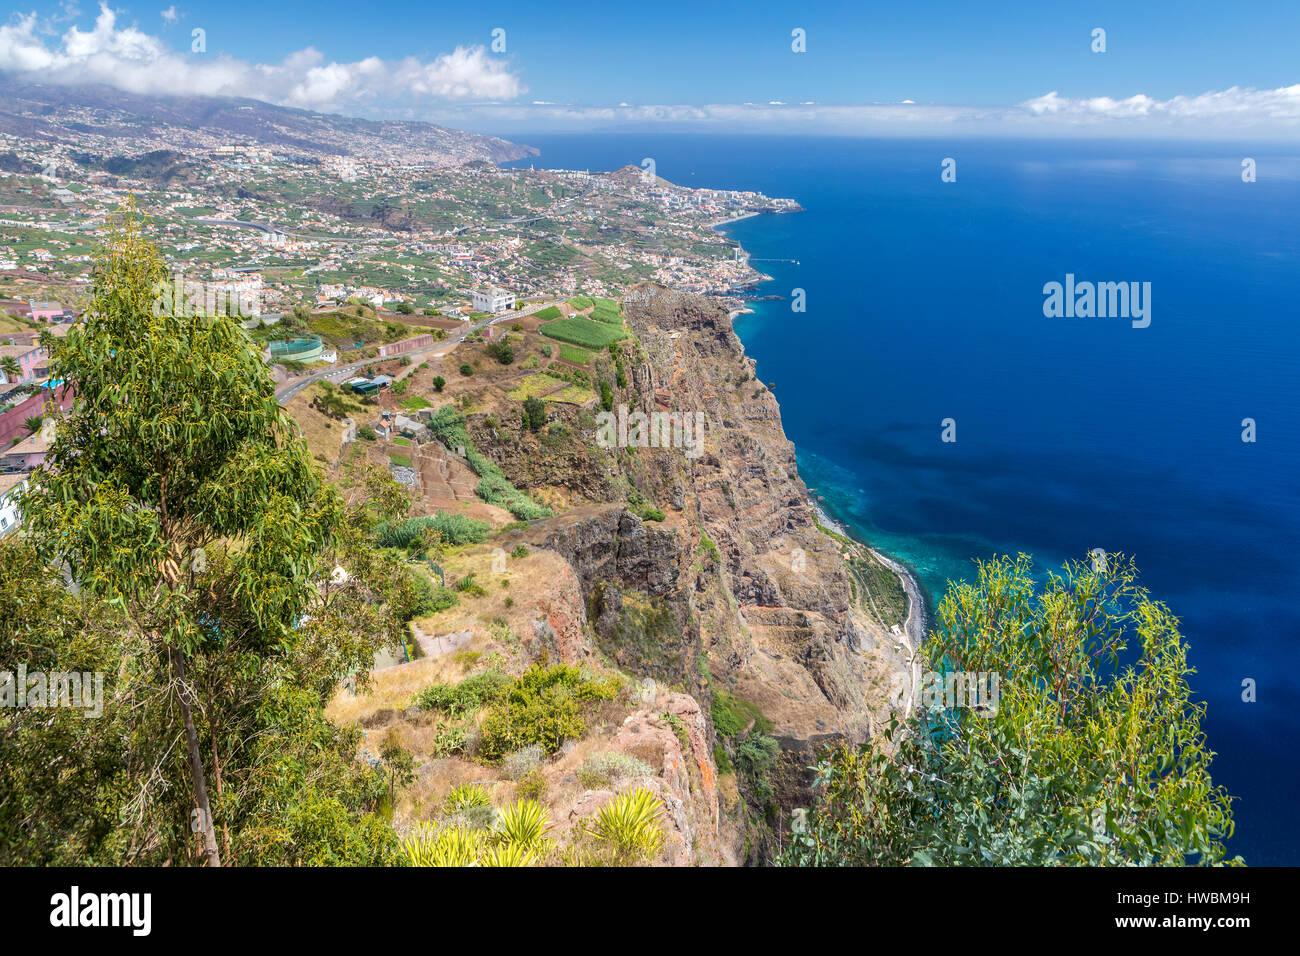 The panoramic terrace (with glass floor) at the top of Cabo Girao cliff, Câmara de Lobos, Madeira, Portugal. Stock Photo